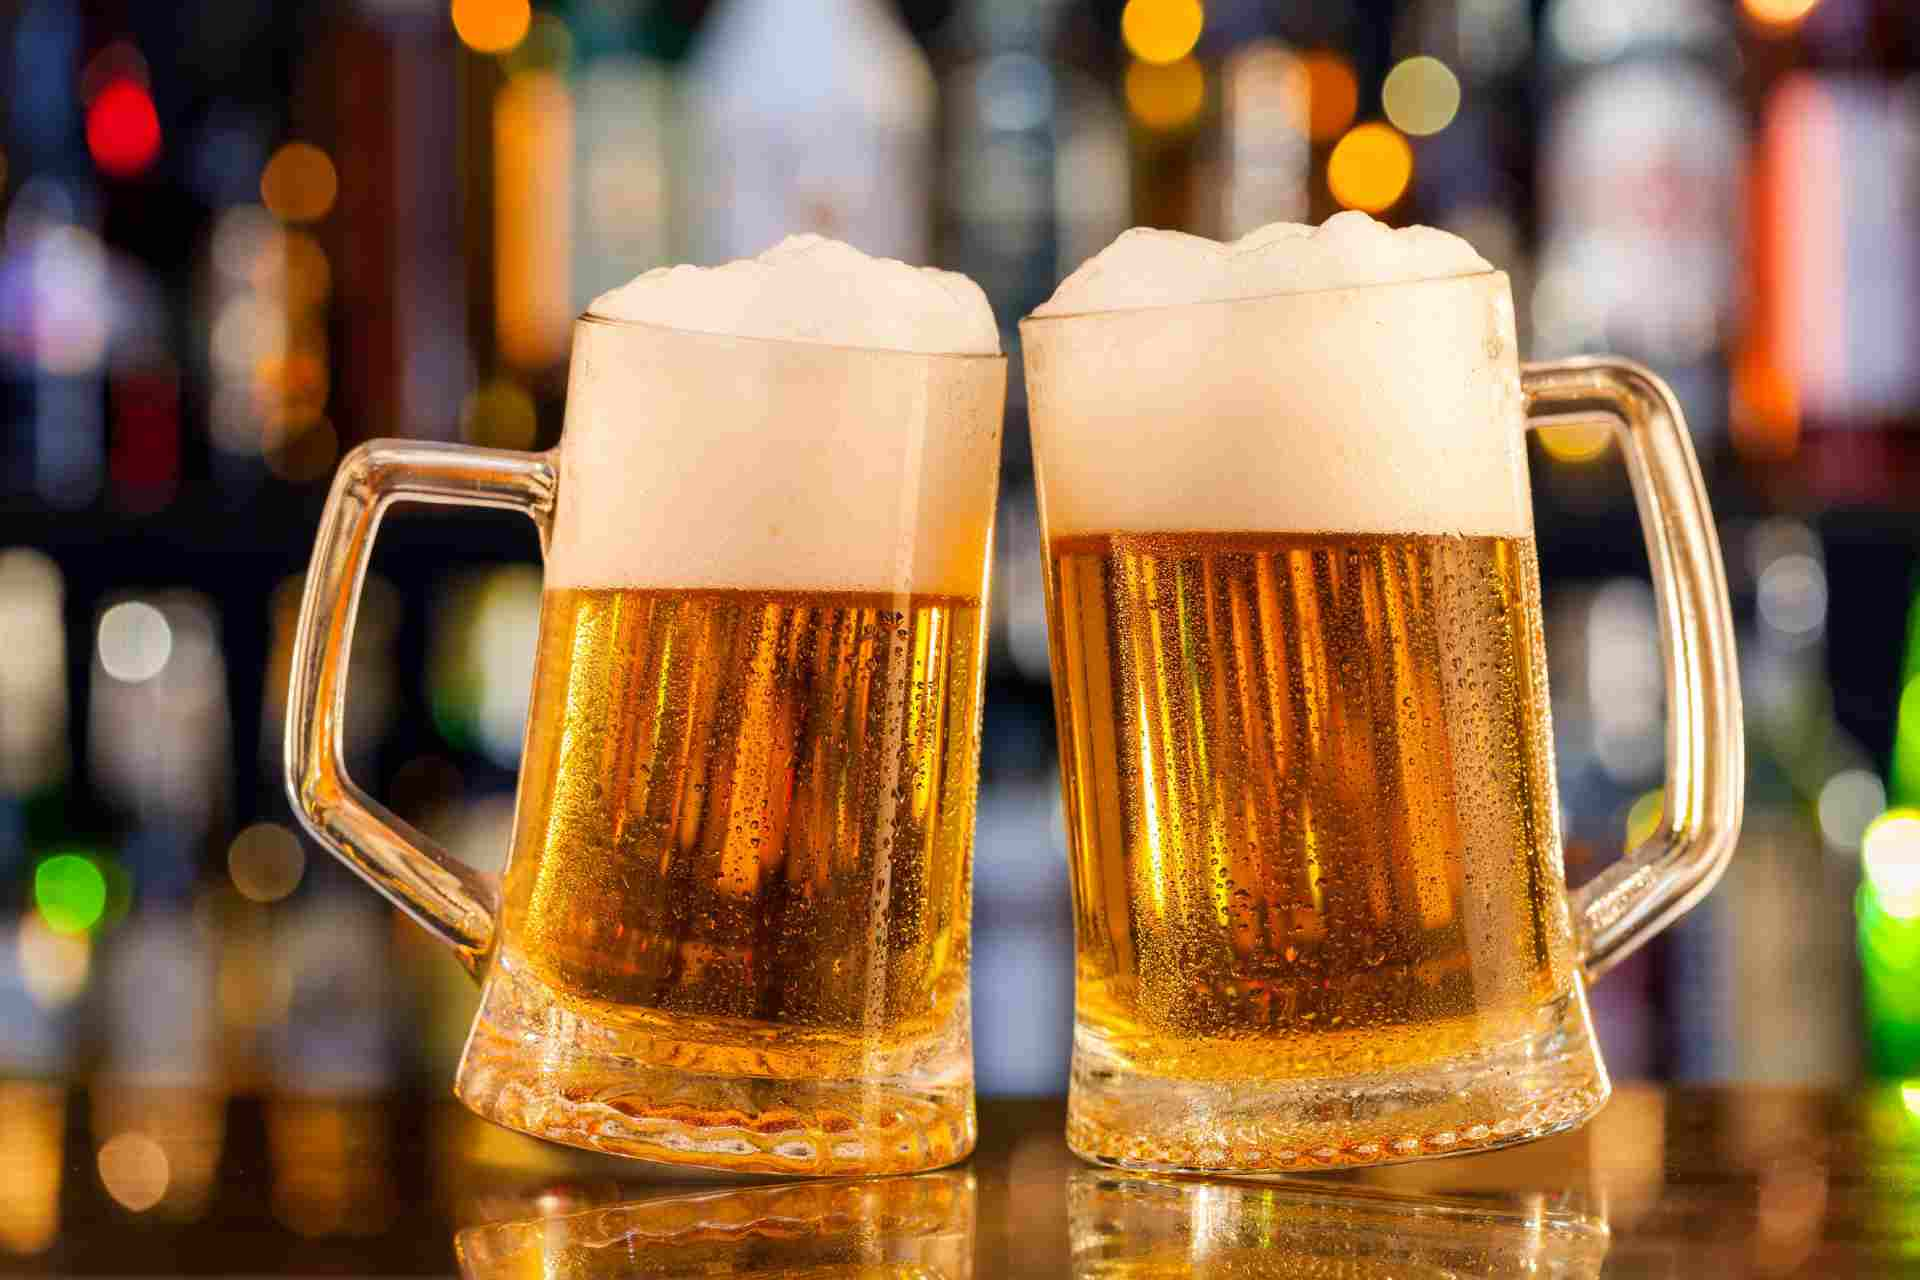 cerveza-Tlaxcala-Mexico-2020-covid